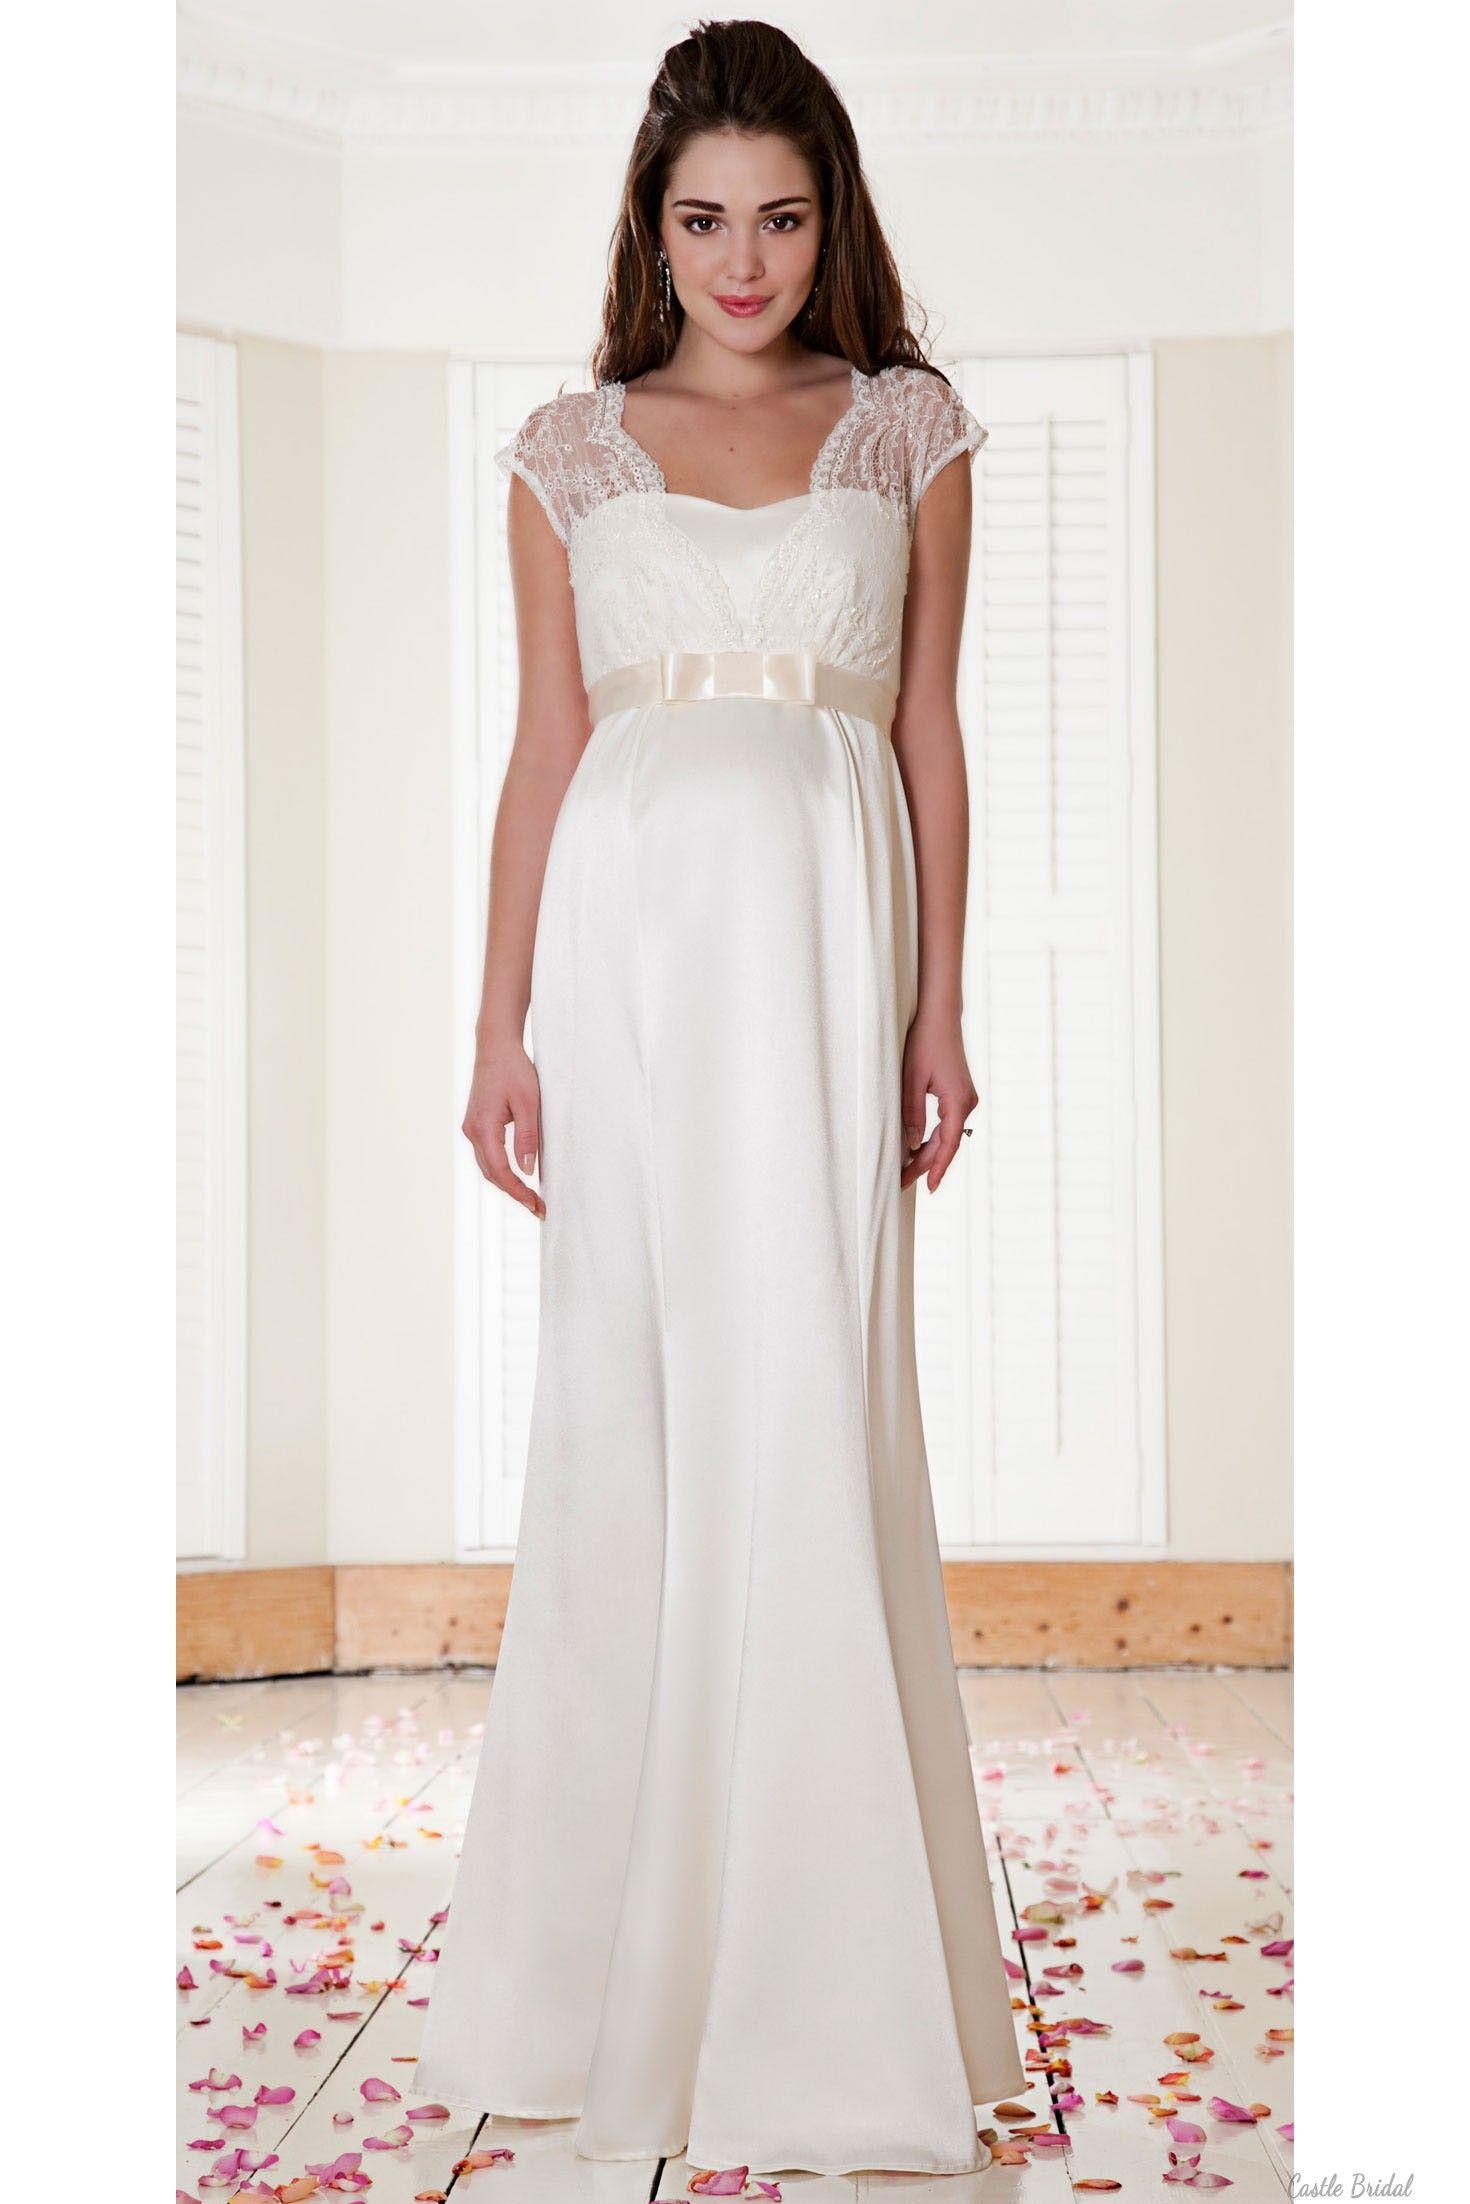 Romantic Lace And Satin Long Mermaid Maternity Wedding Dress